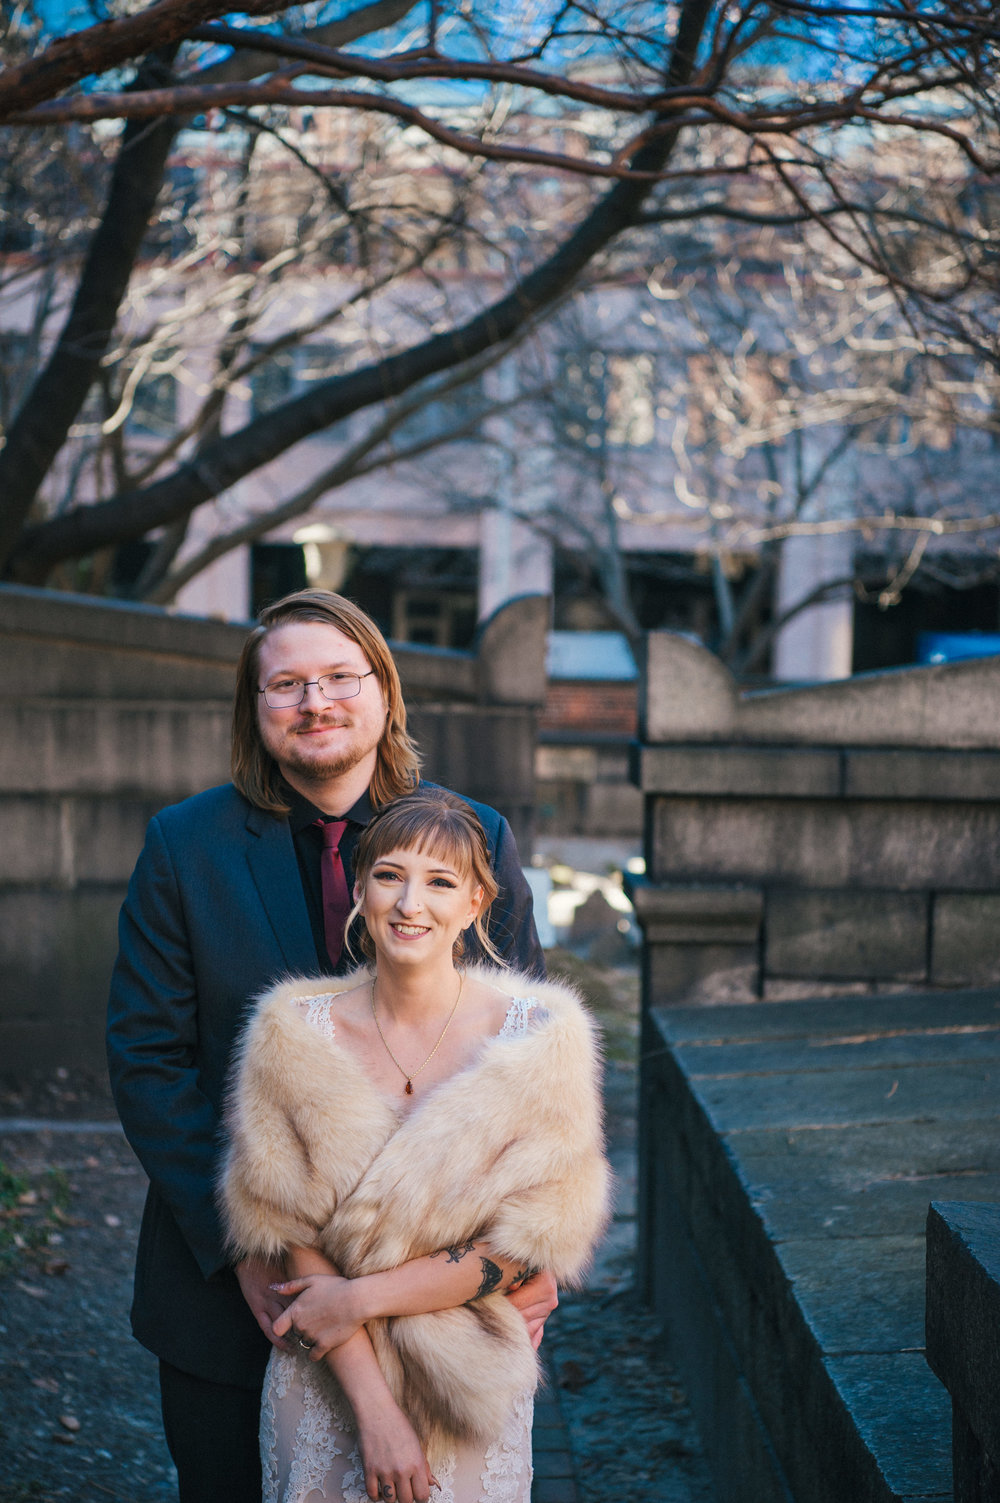 Amber and Kyles Wedding 17.jpg